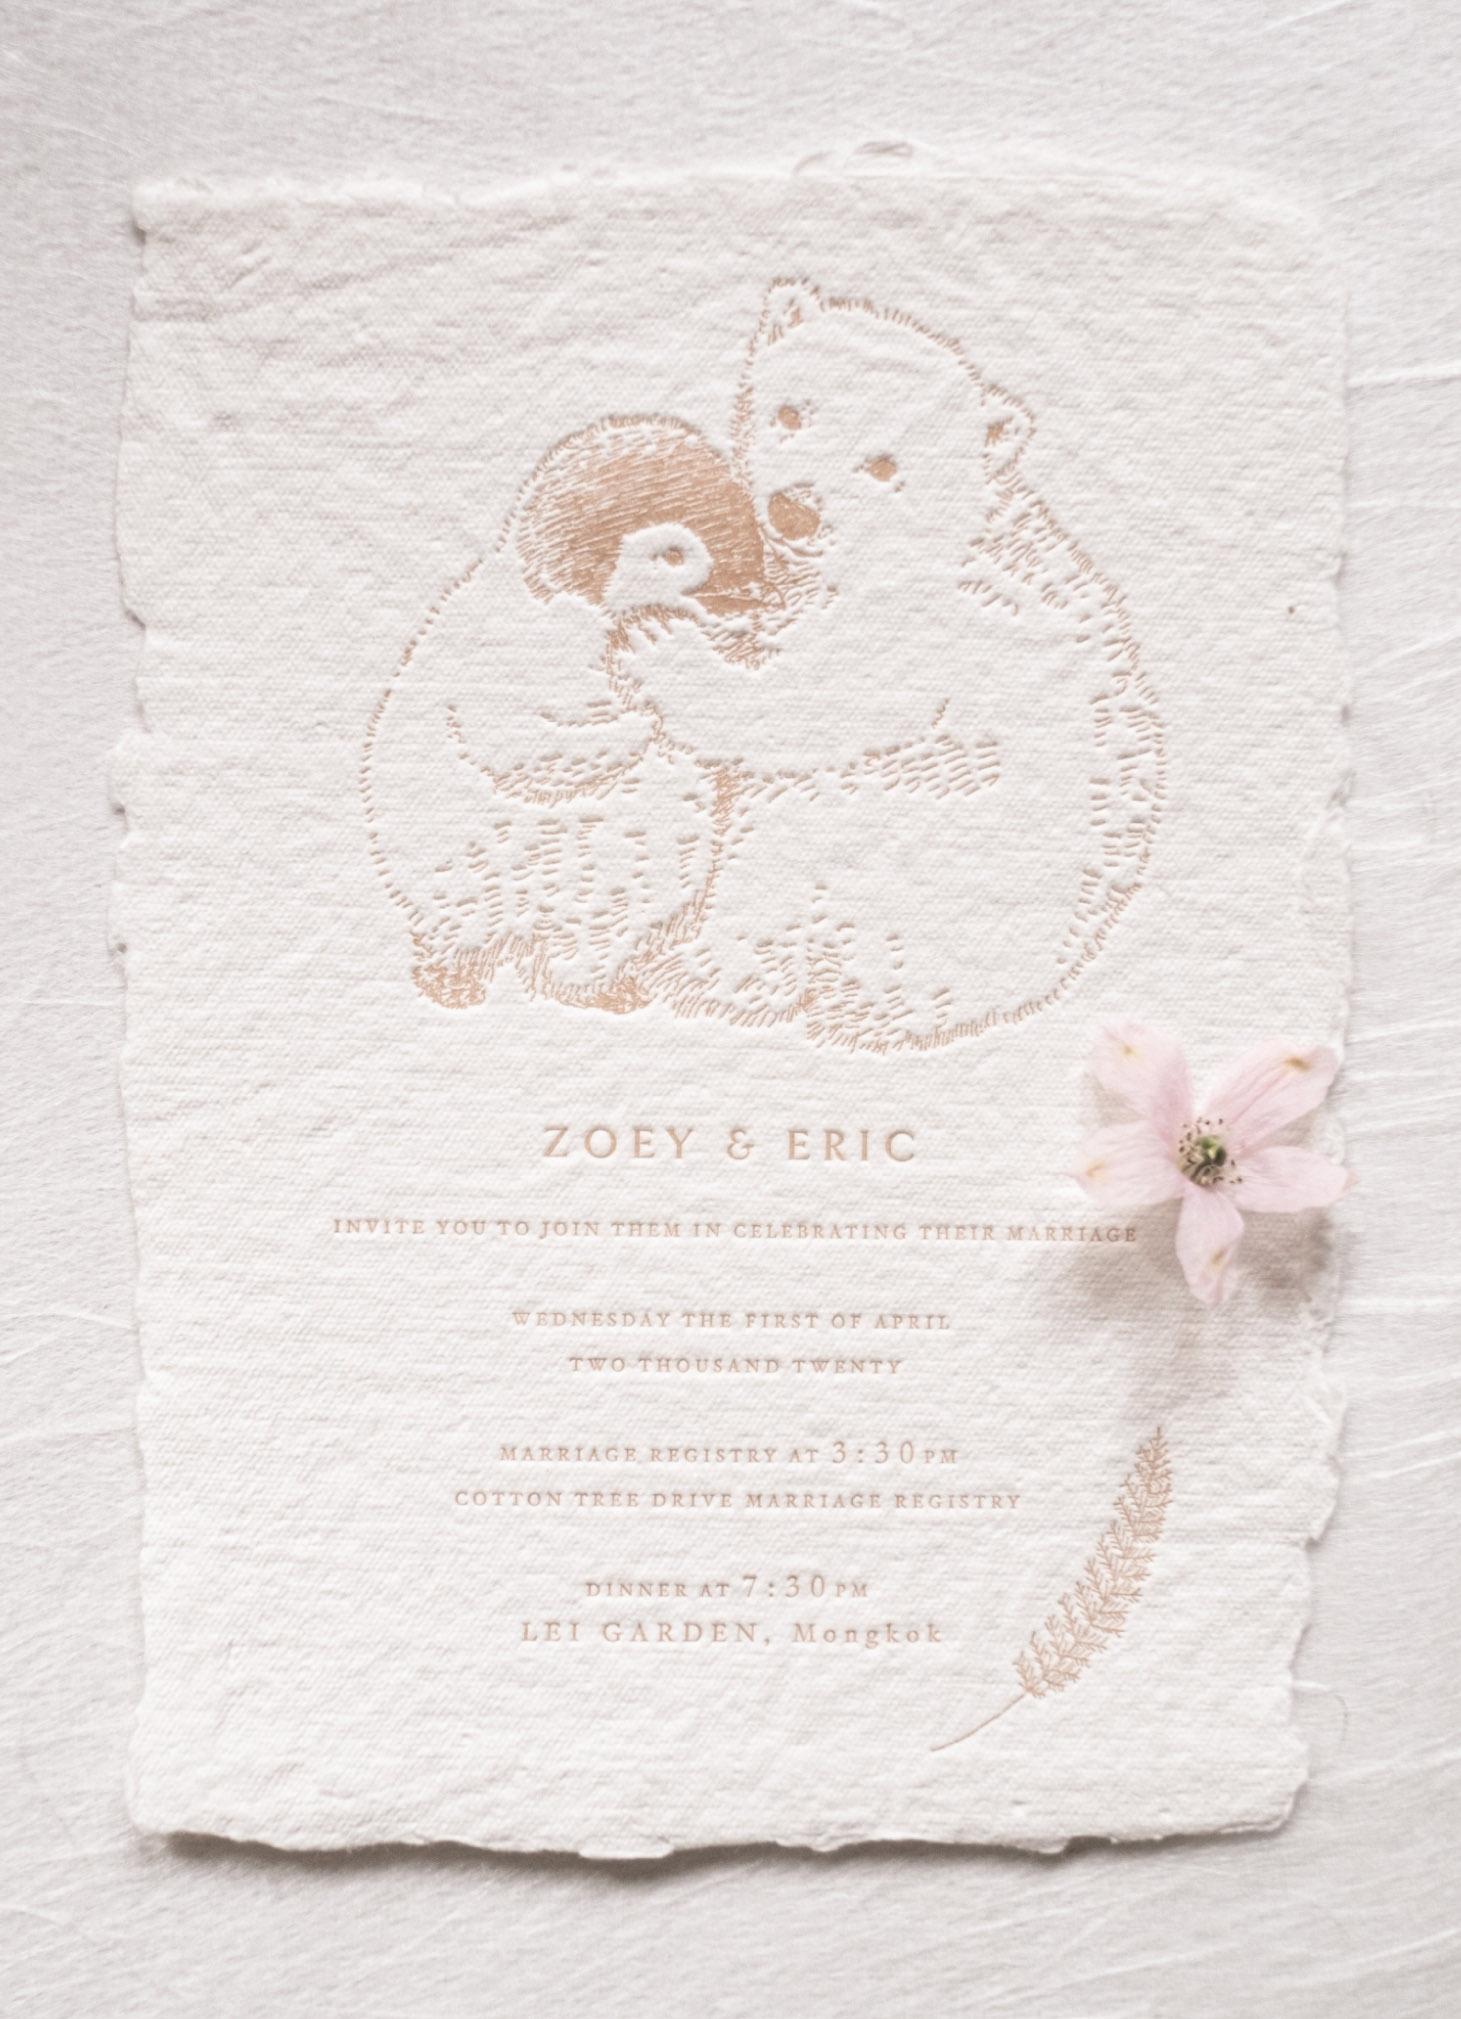 Polar-bear-and-penguin-invitation-in-letterpress-in-blush-color-cotton-rag-paper